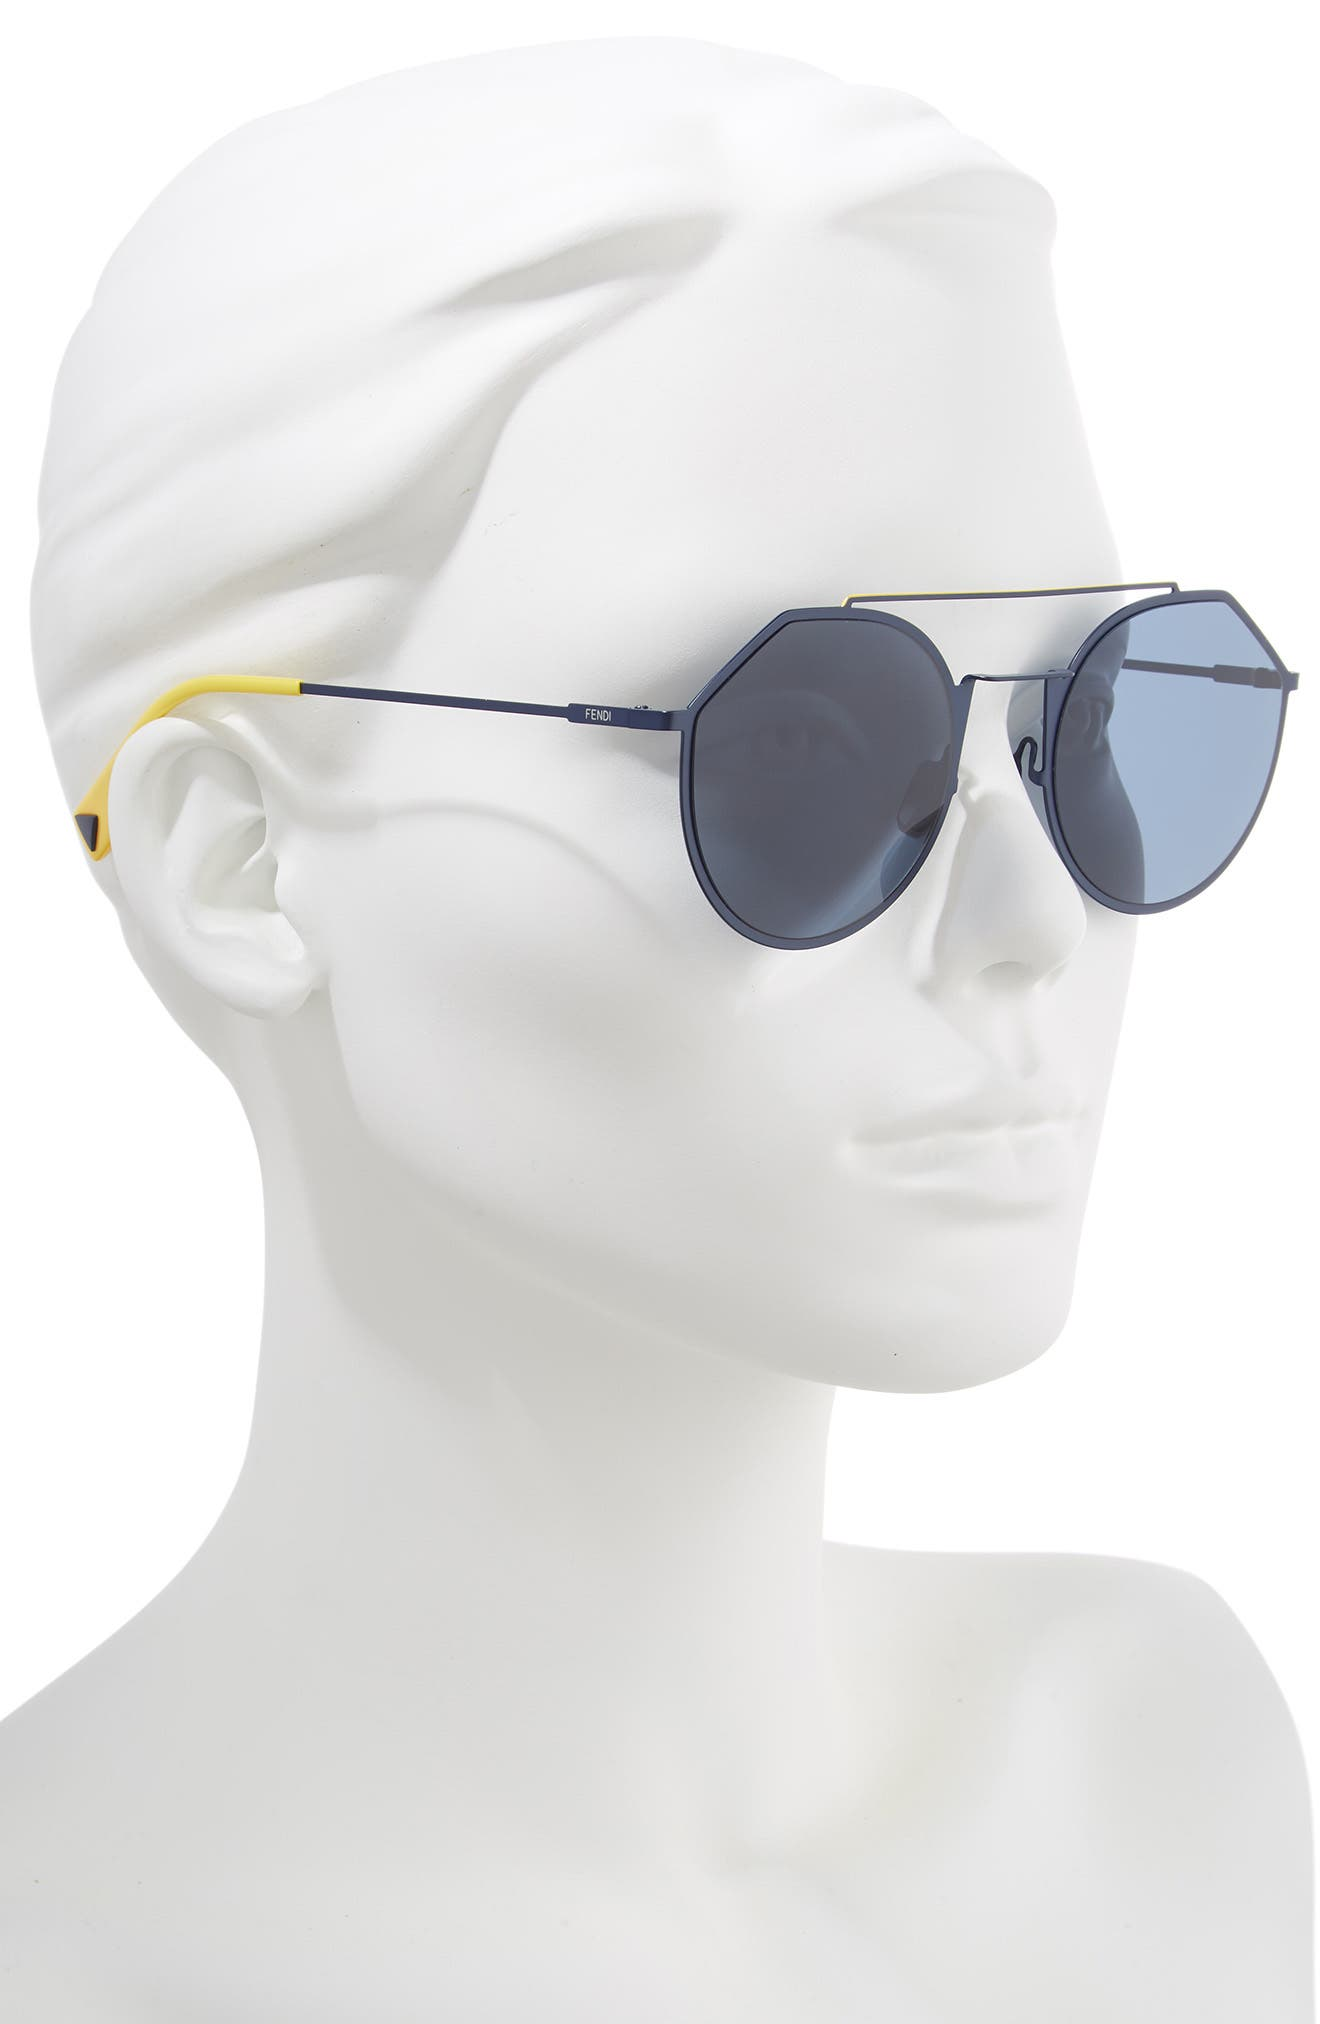 54mm Polarized Round Sunglasses,                             Alternate thumbnail 2, color,                             BLUE